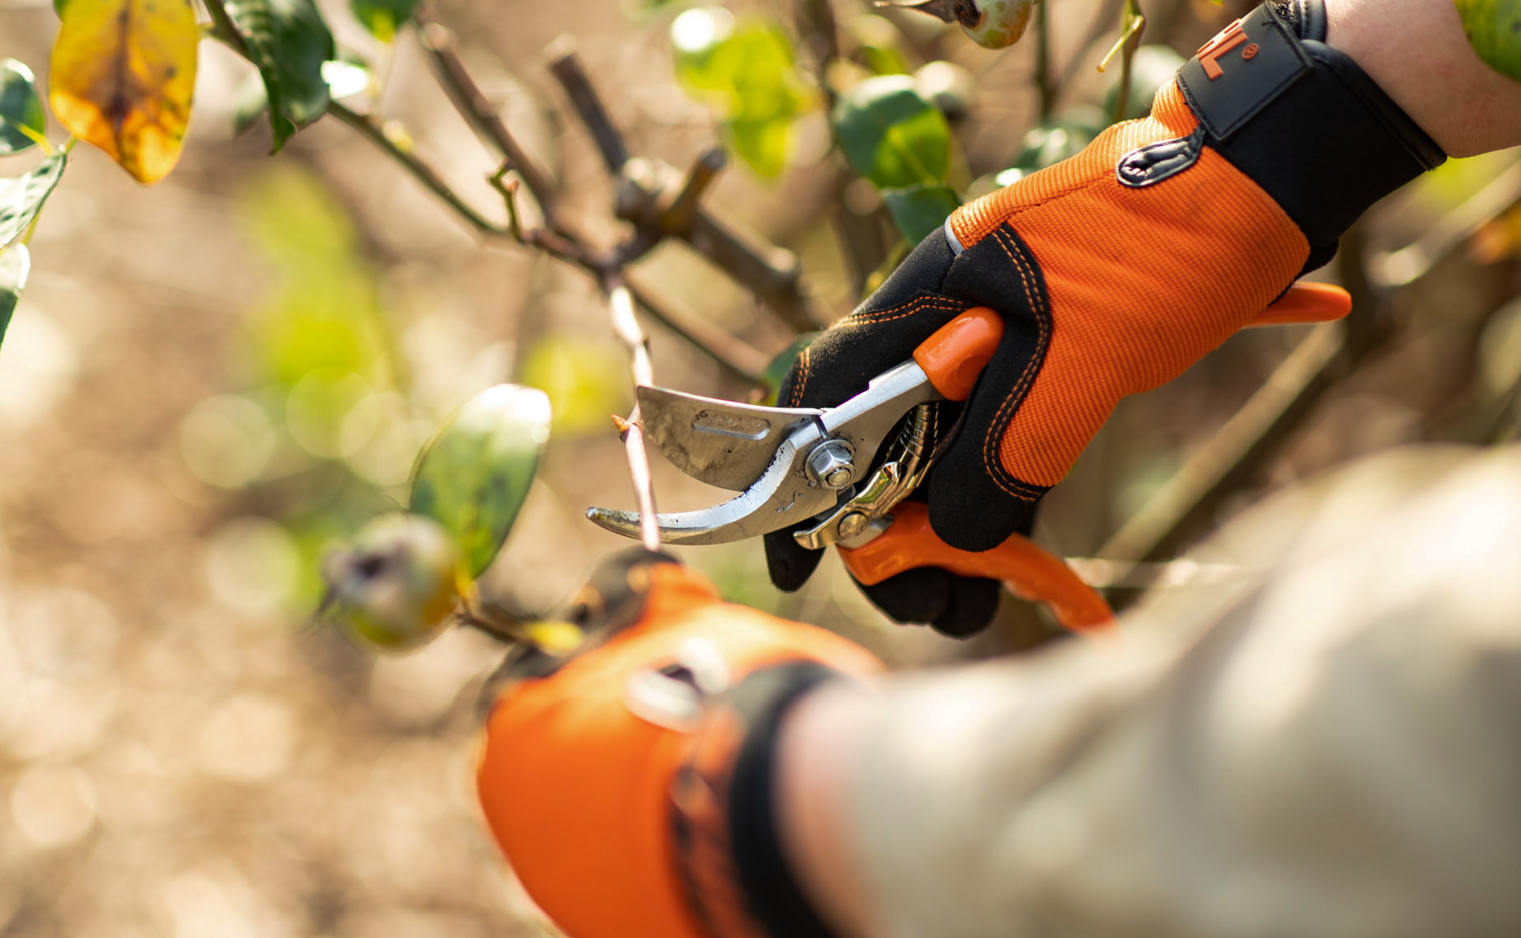 Preparing your garden for Spring